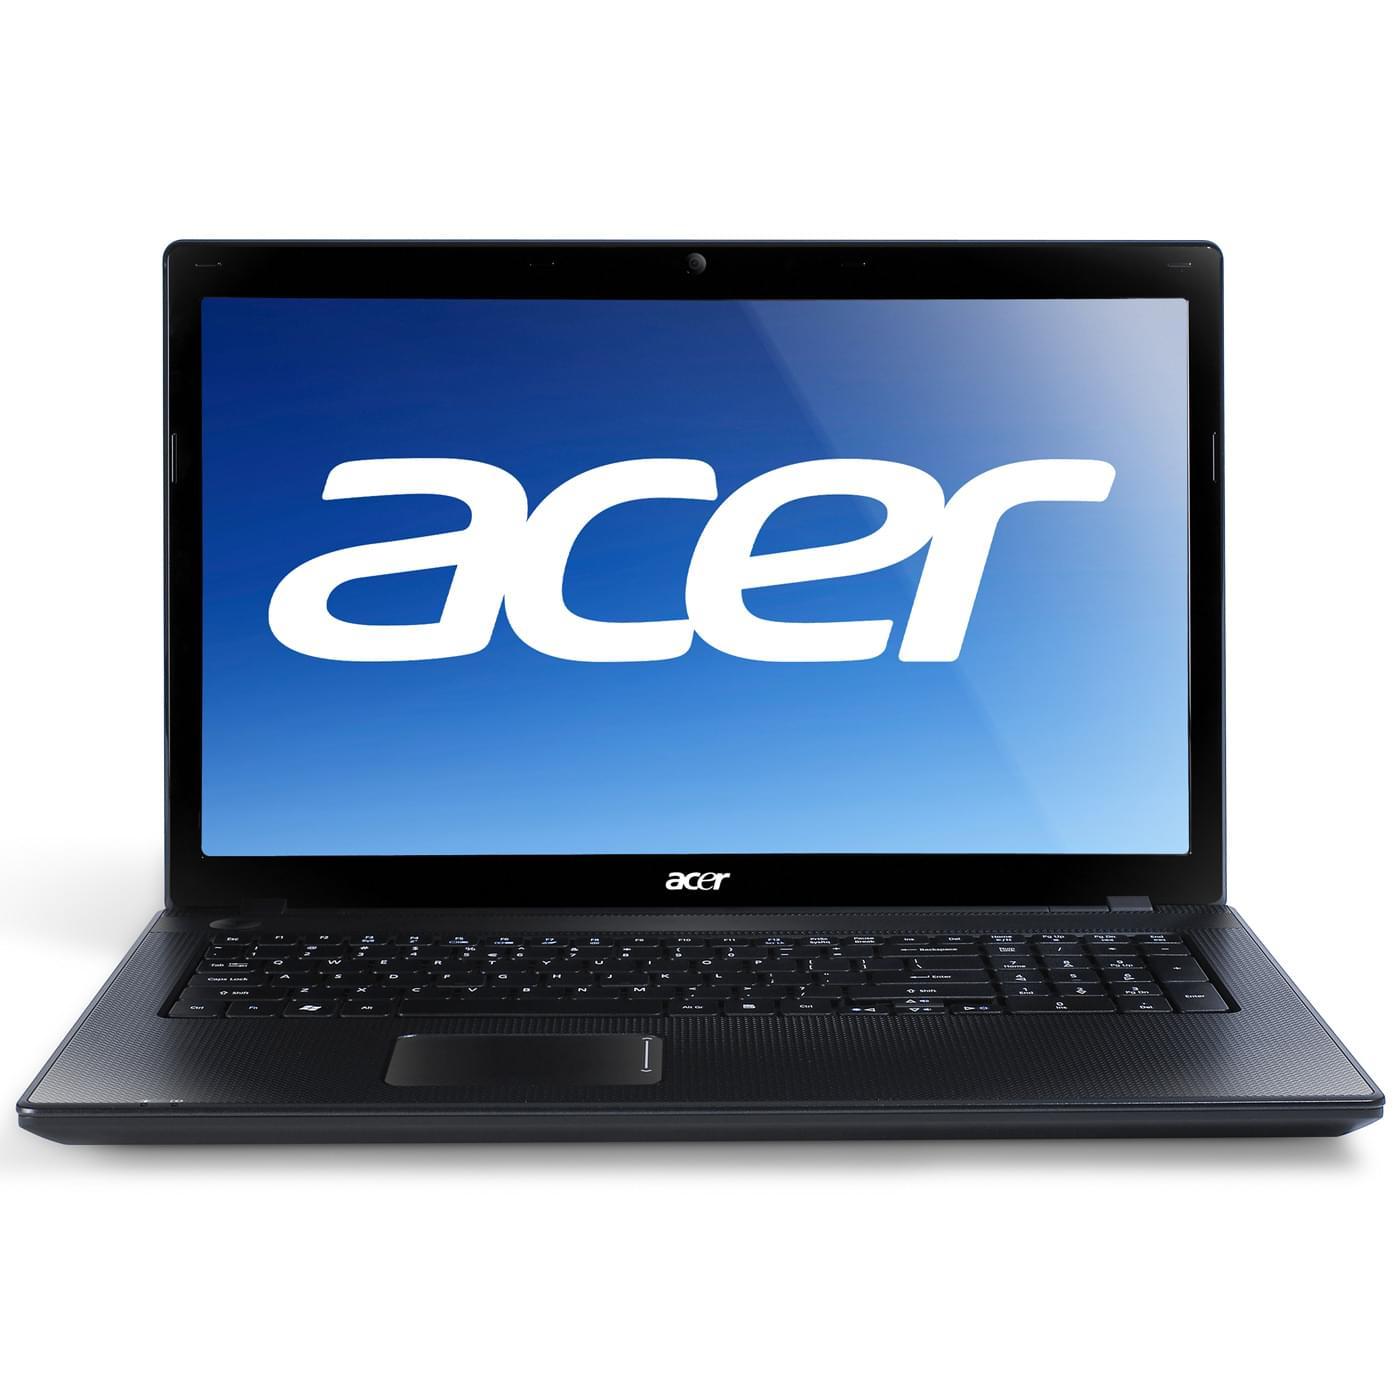 Acer 7250-E304G32Mnkk (NX.RL6EF.001) - Achat / Vente PC portable sur Cybertek.fr - 0